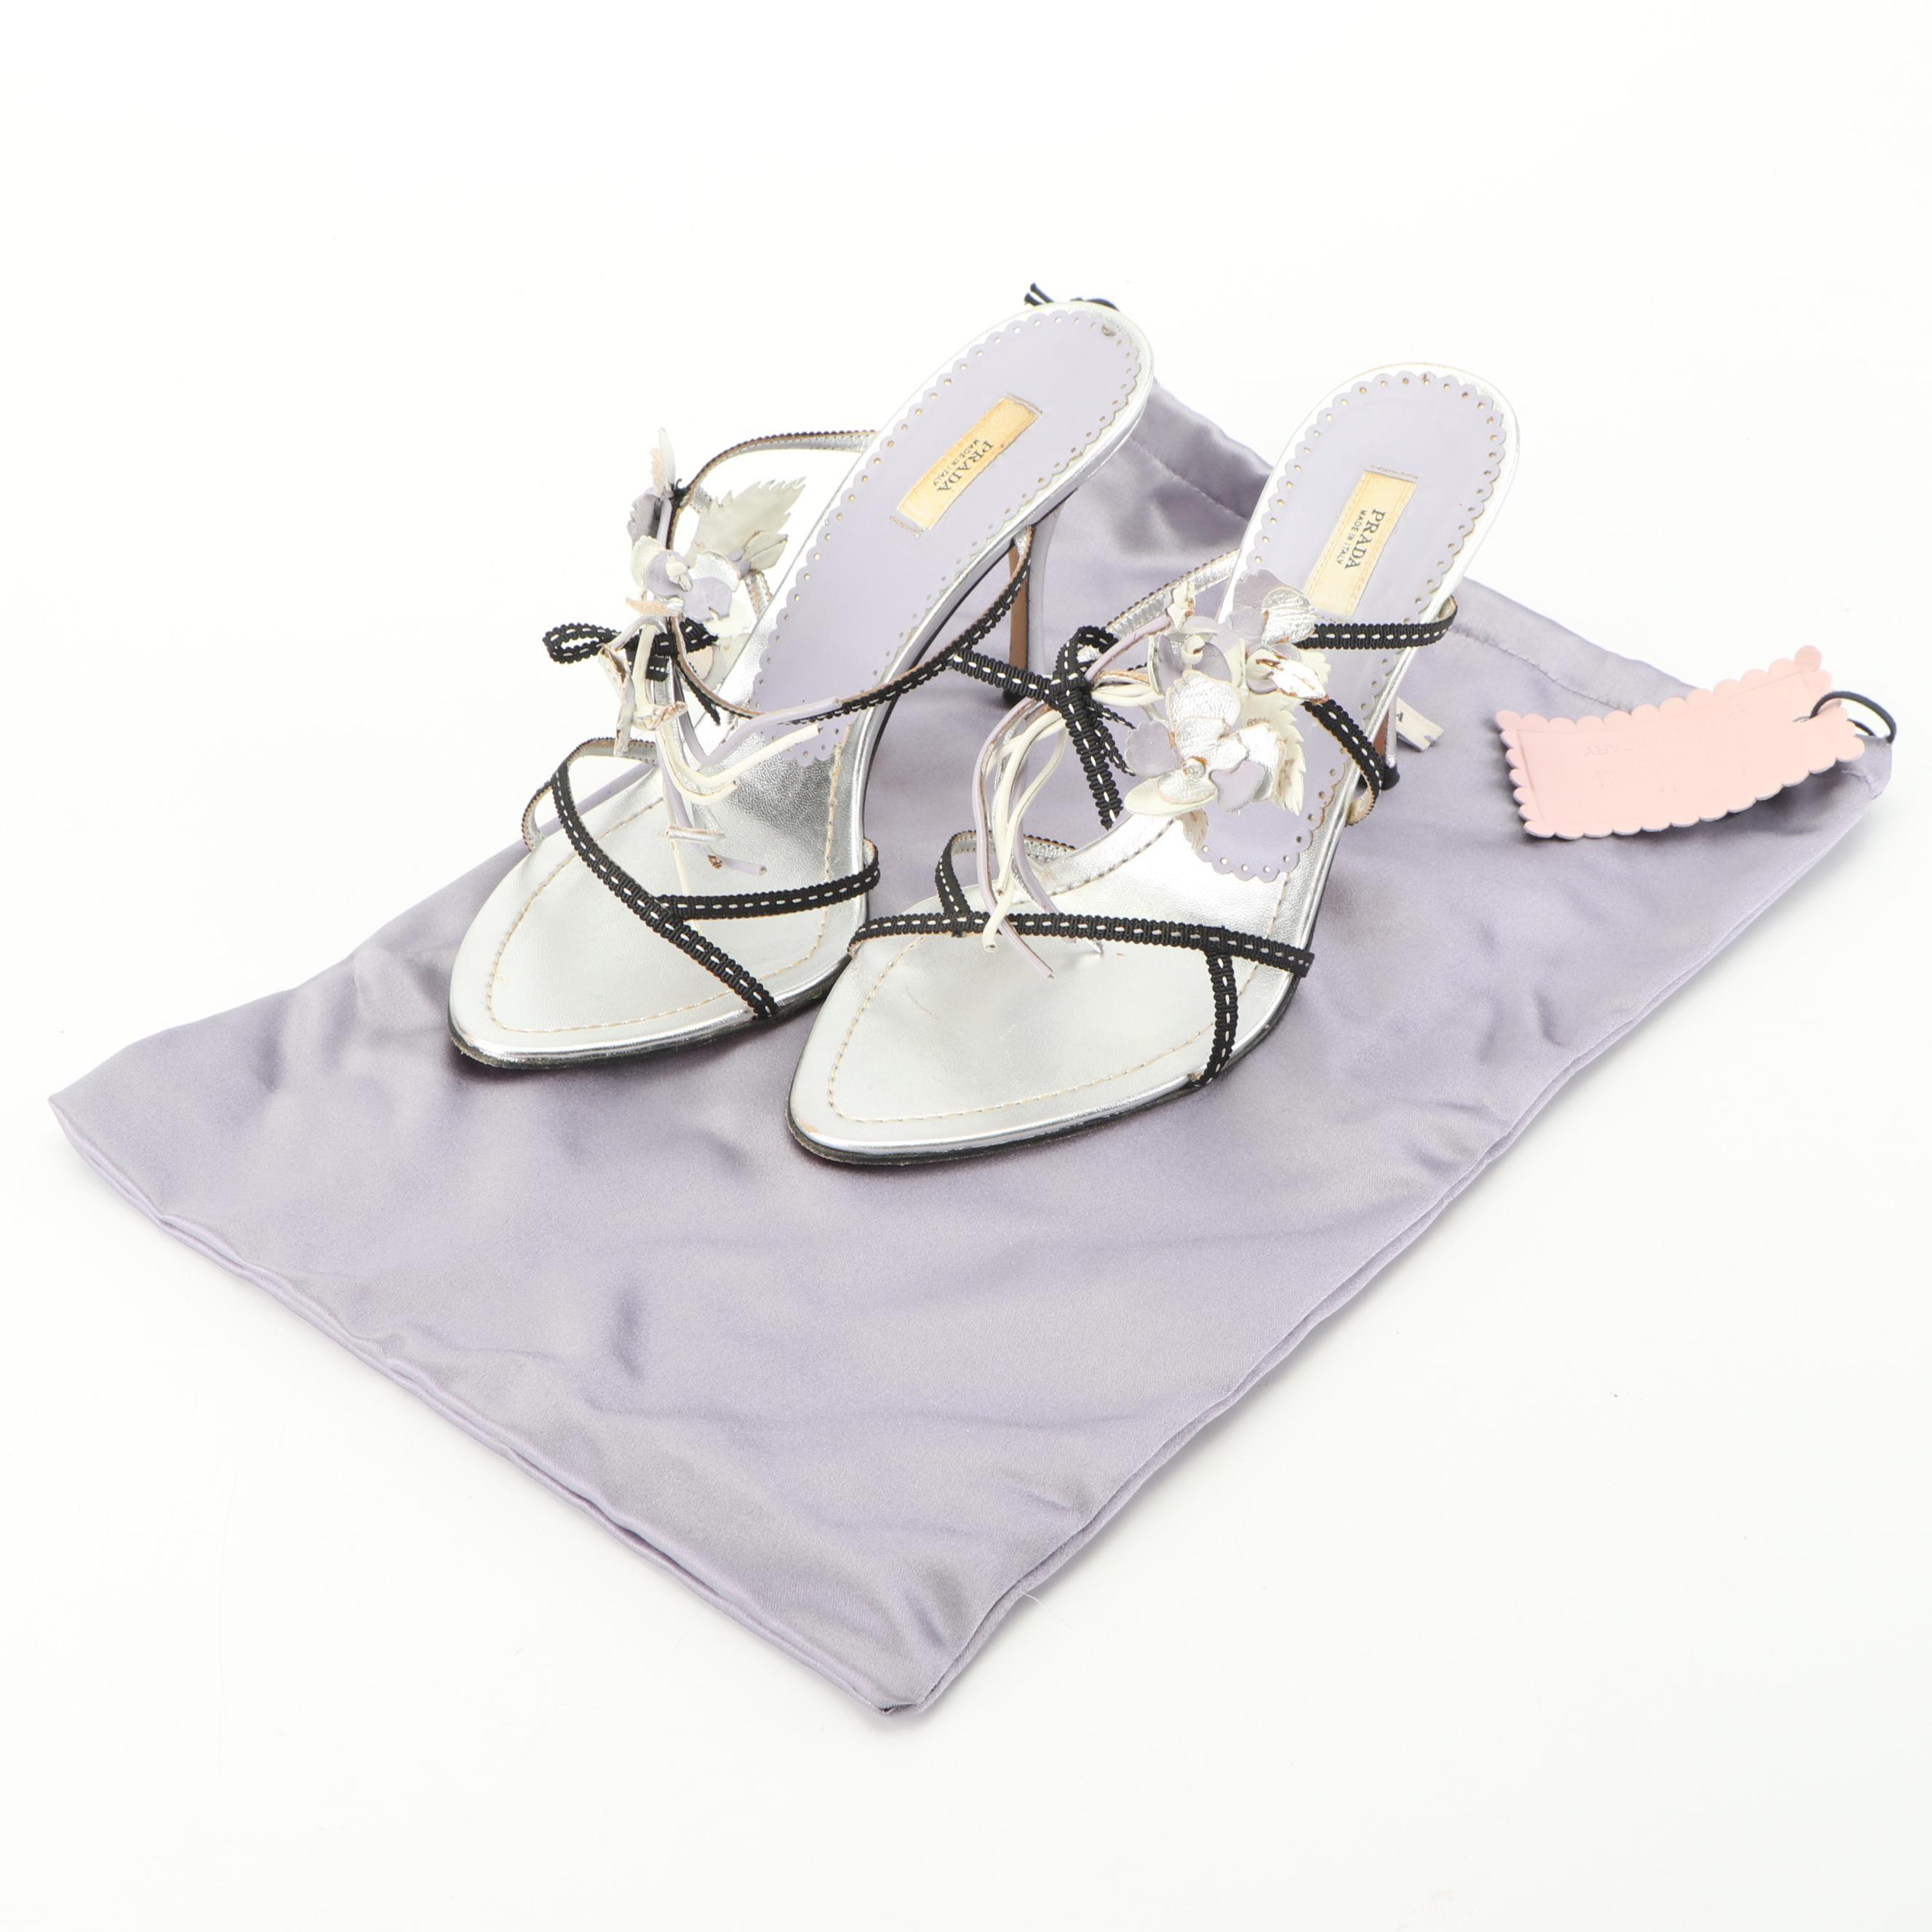 Prada for Neiman Marcus Calzature Donna Strappy Sandals